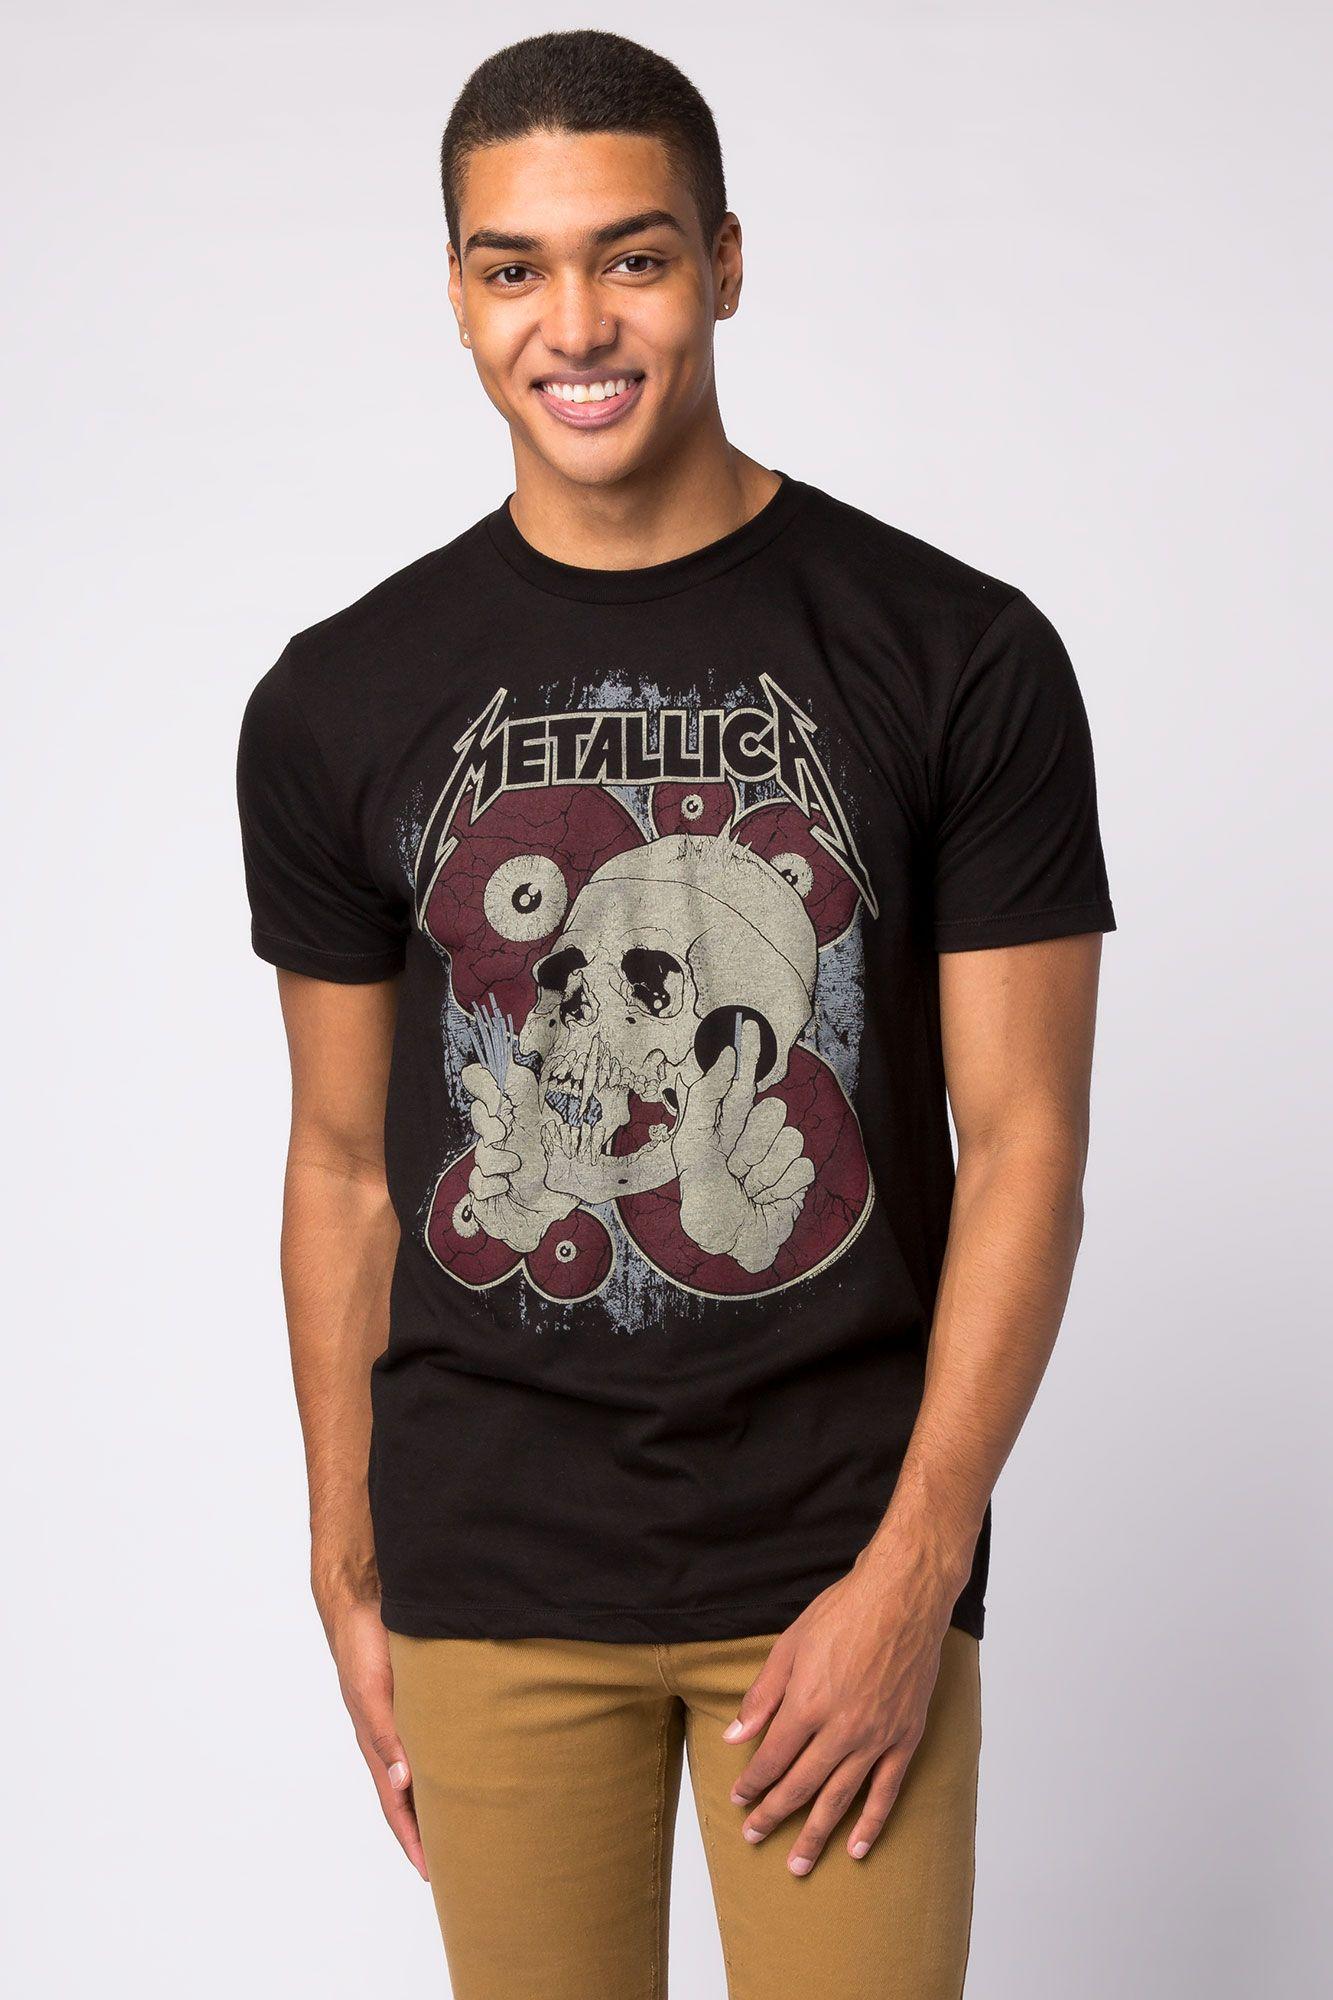 61ddee7e Guys Graphic 'Metallica Skull' Licensed Tee   Bluenotes ...